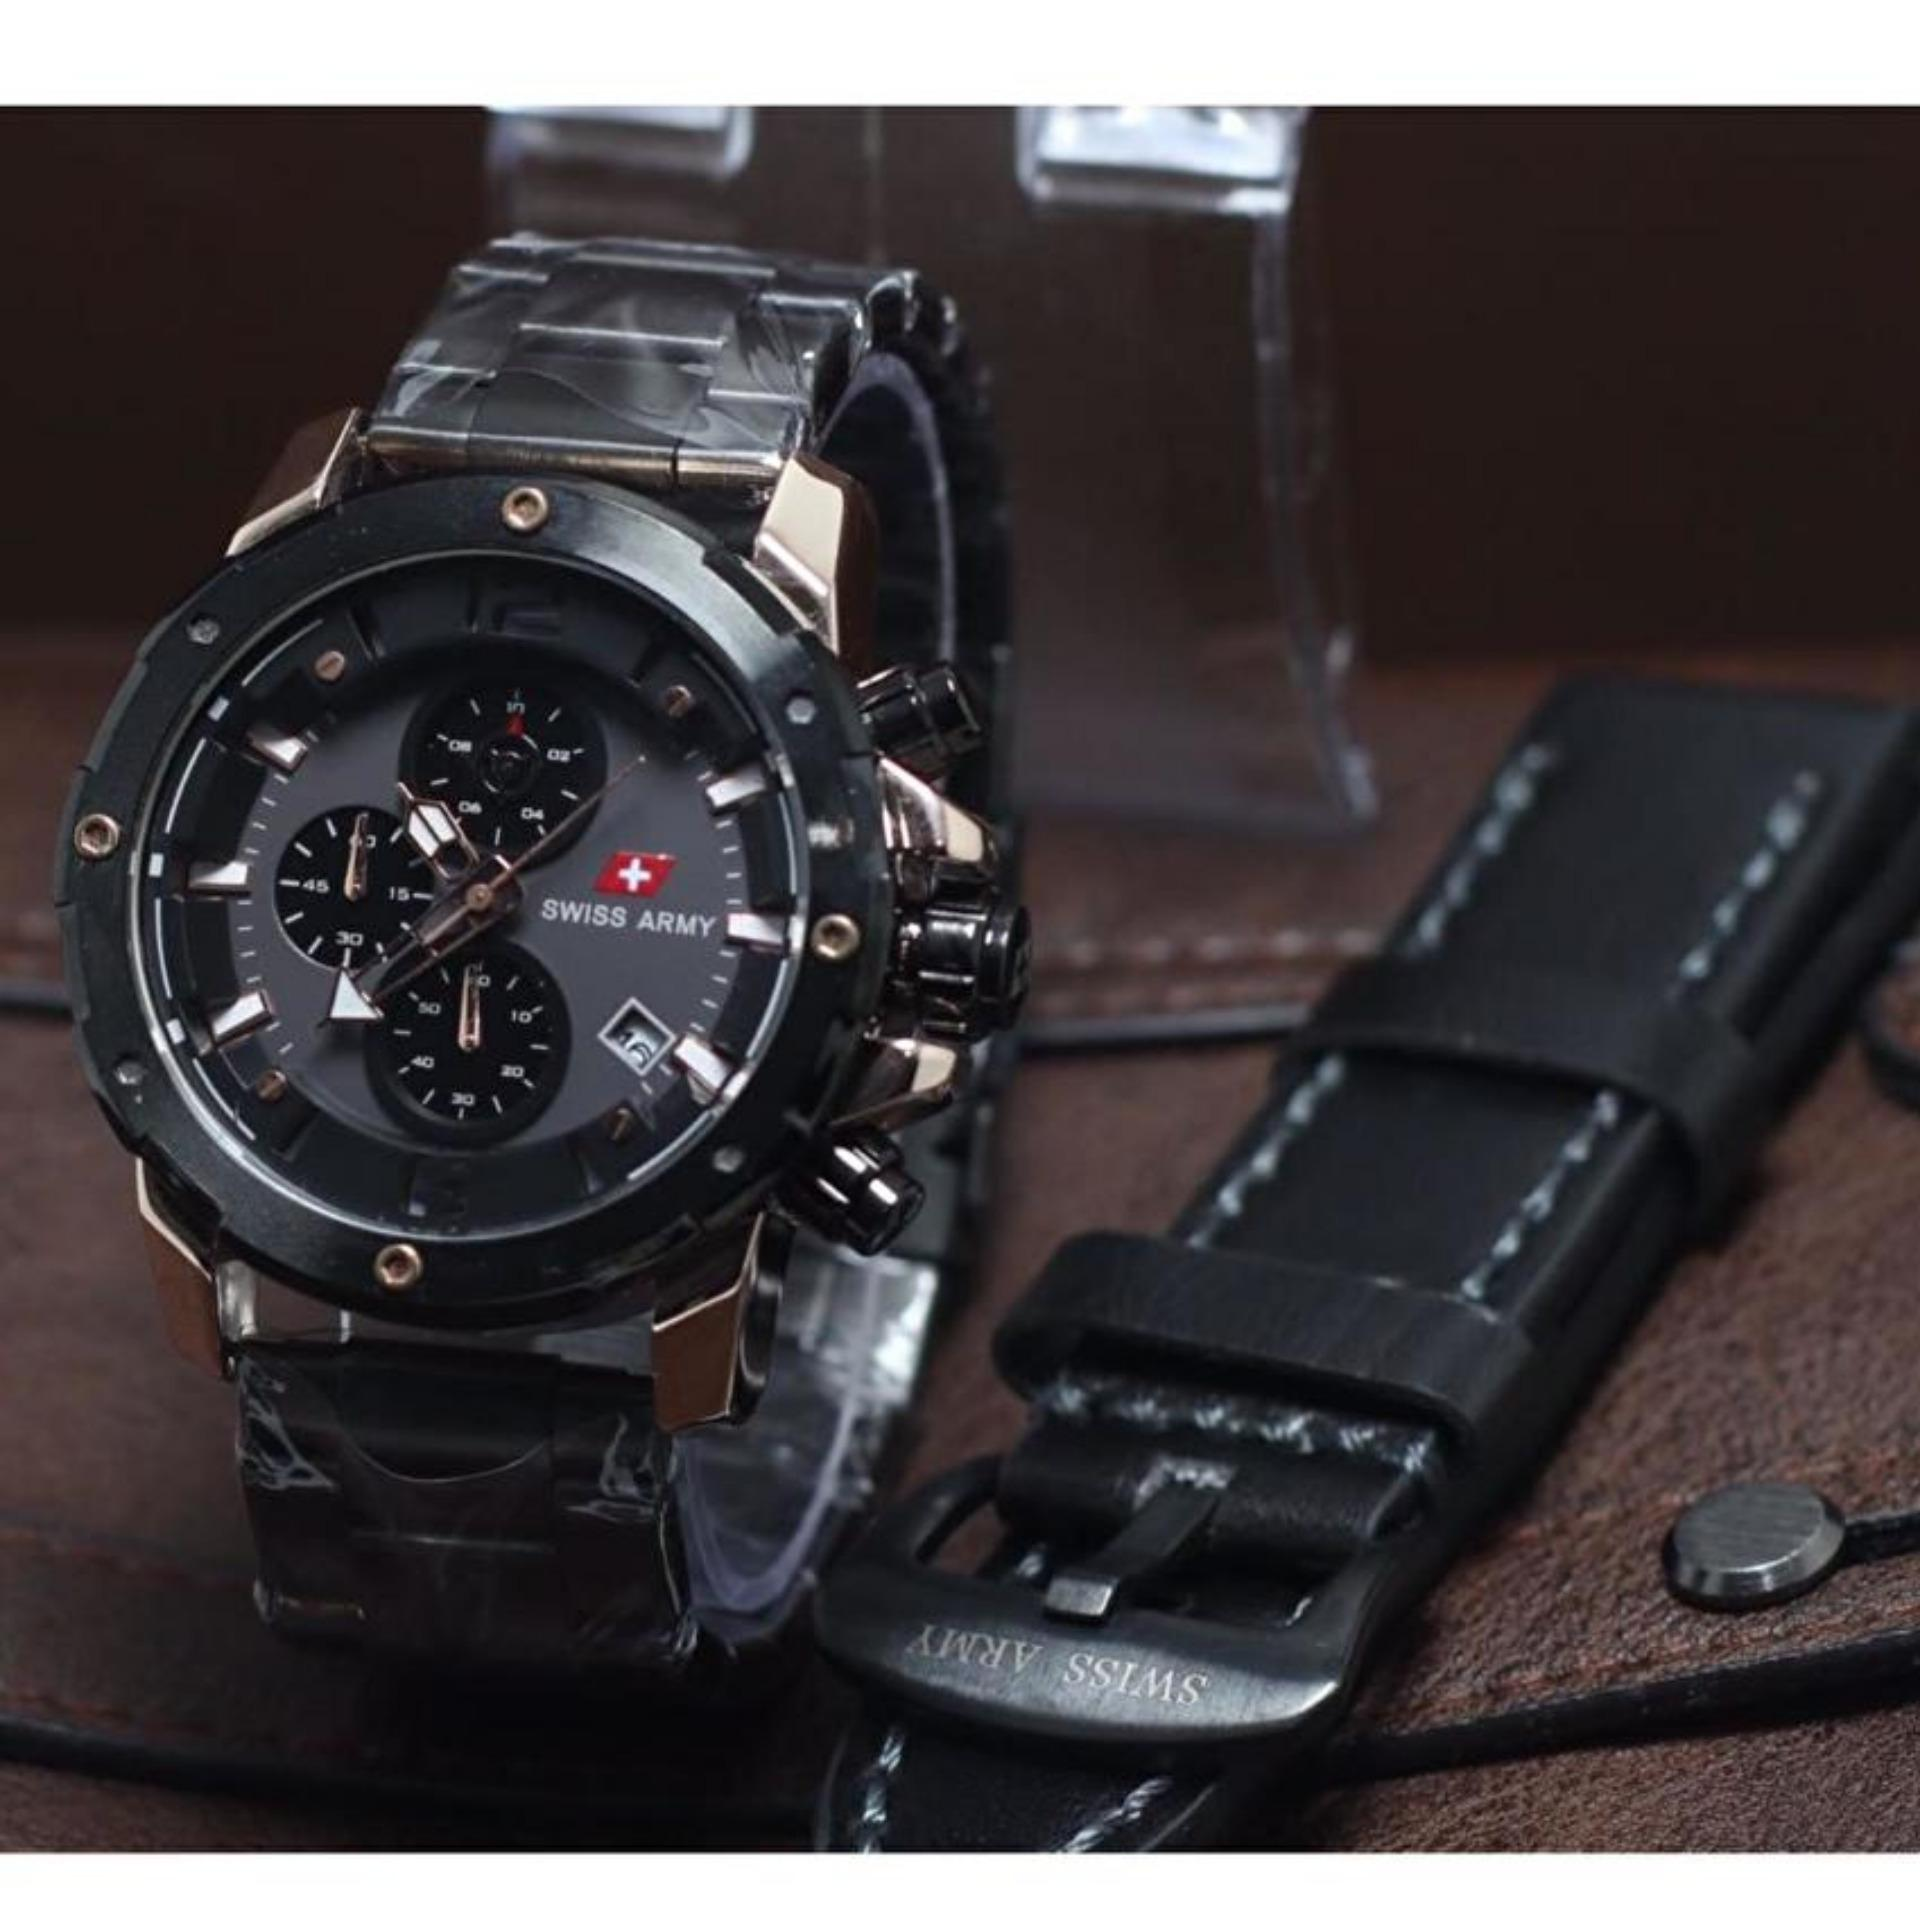 Swiss Army Chrono Sa9205m Jam Tangan Pria Double Strap Stainlessteel Dual Time Sa 1502 Full Black